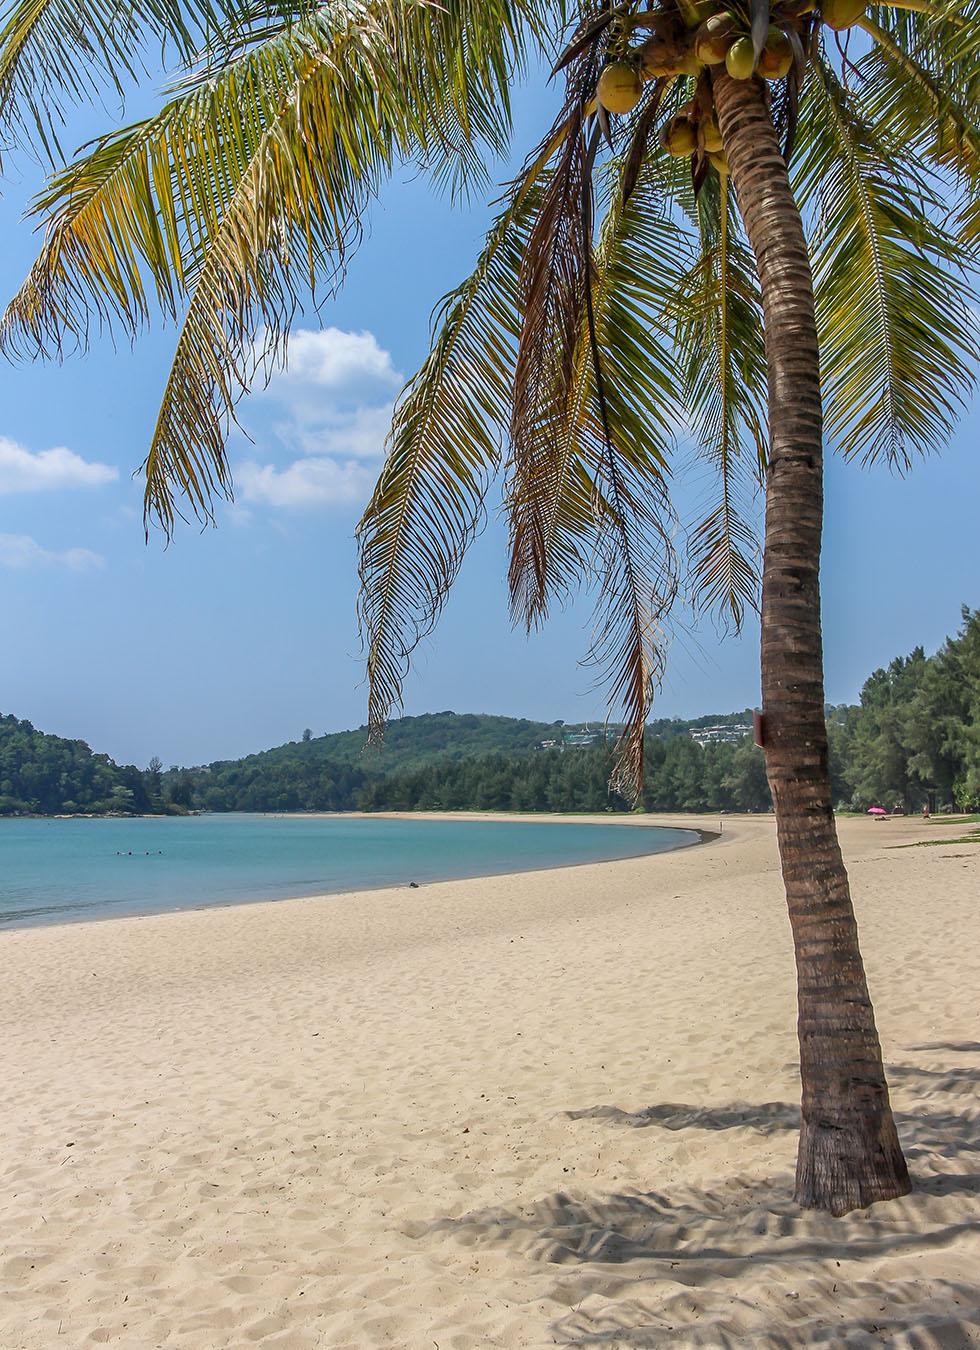 Layan Beach in Phuket